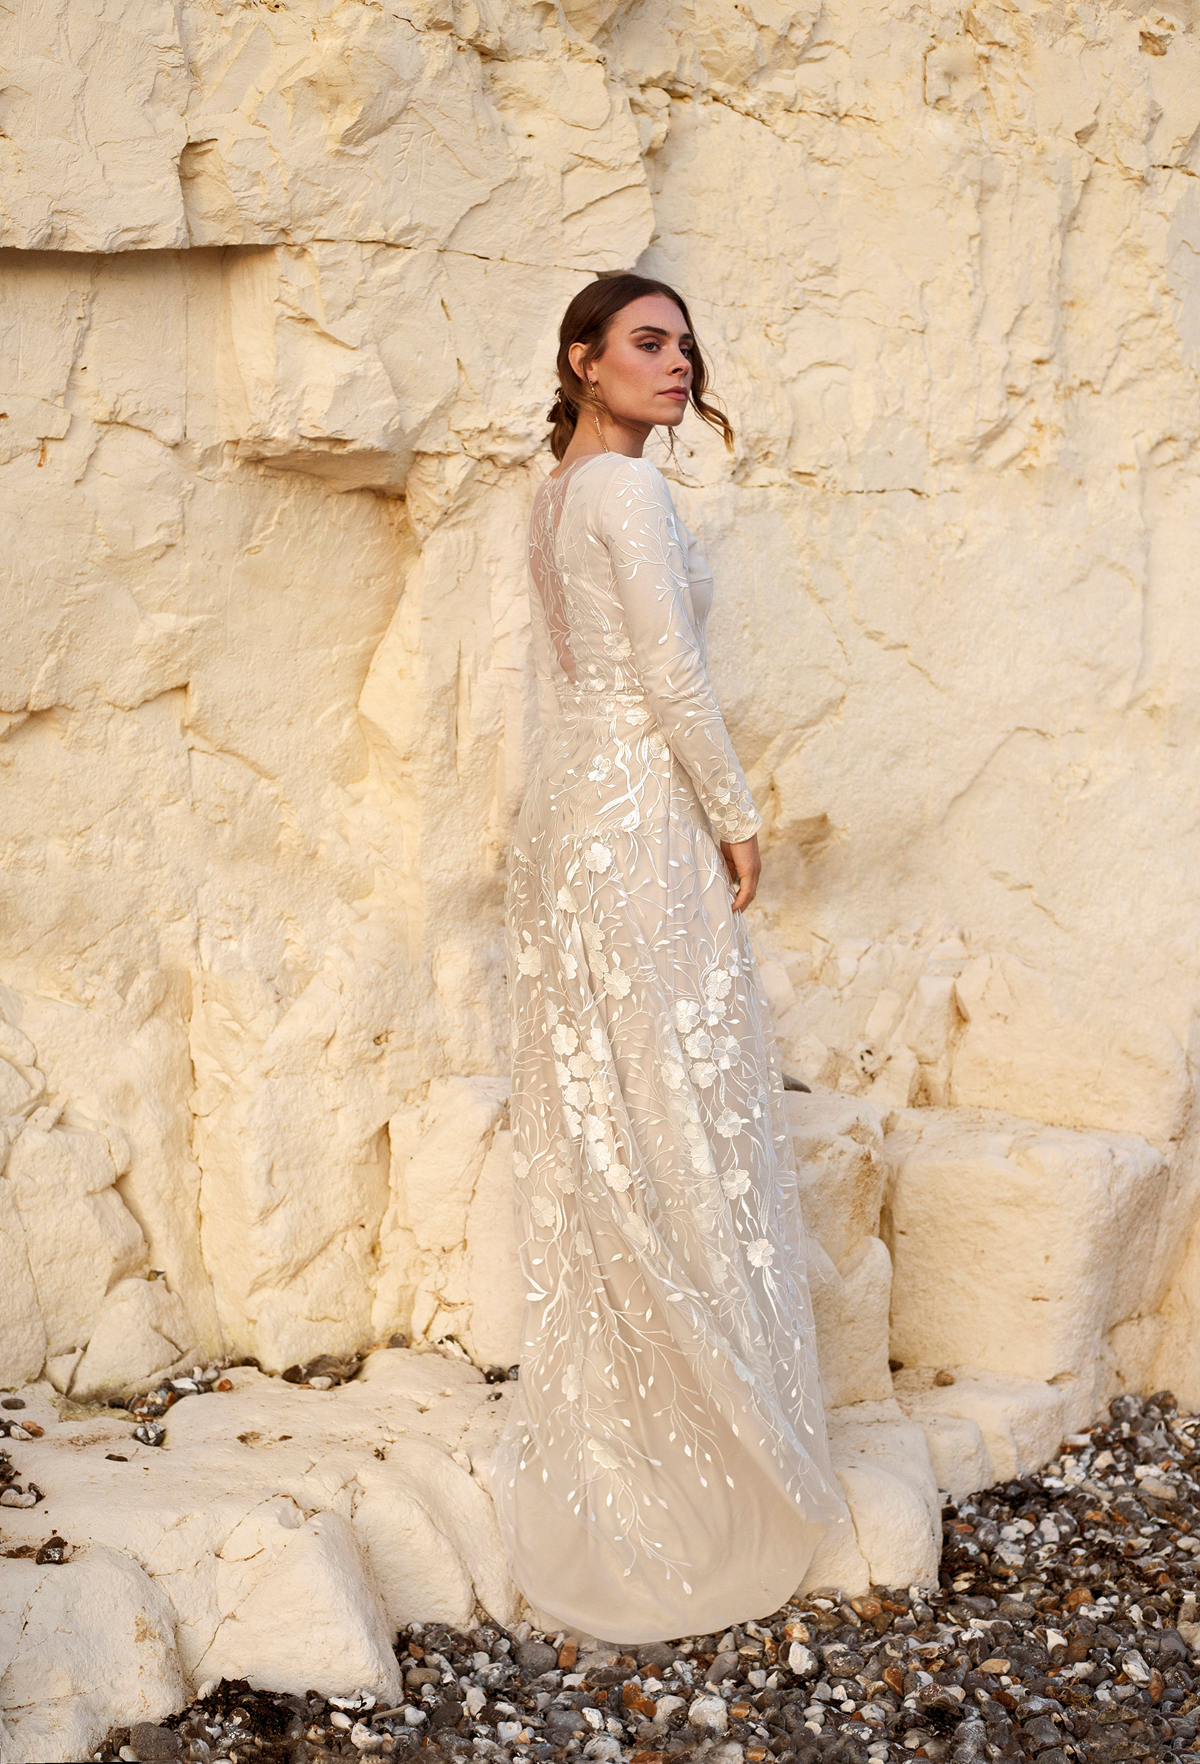 be2818400d Modern bride Autumn English Autumn Coast wedding inspiration bridal fashion  by Seni Dey - Seni Dey